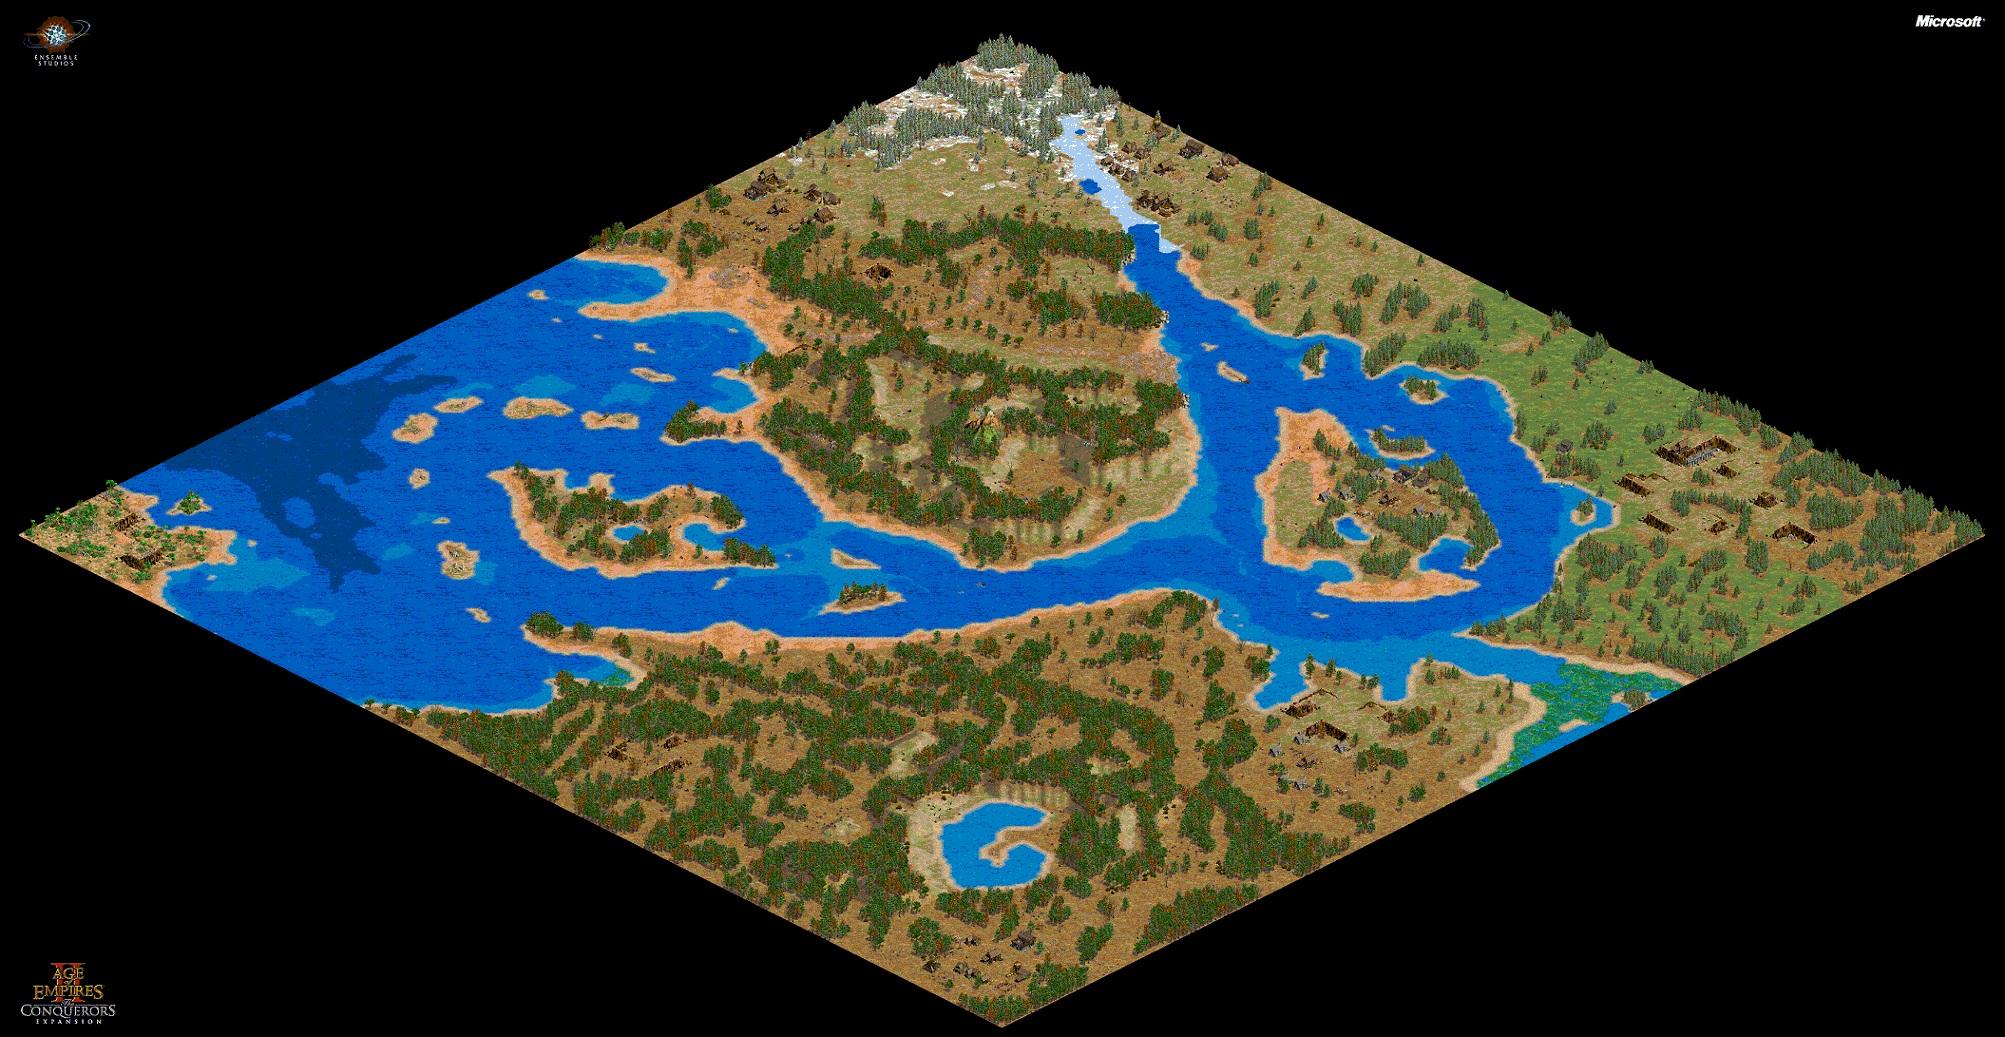 AoC Custom Scenarios for Age of Empires II: The Conquerors